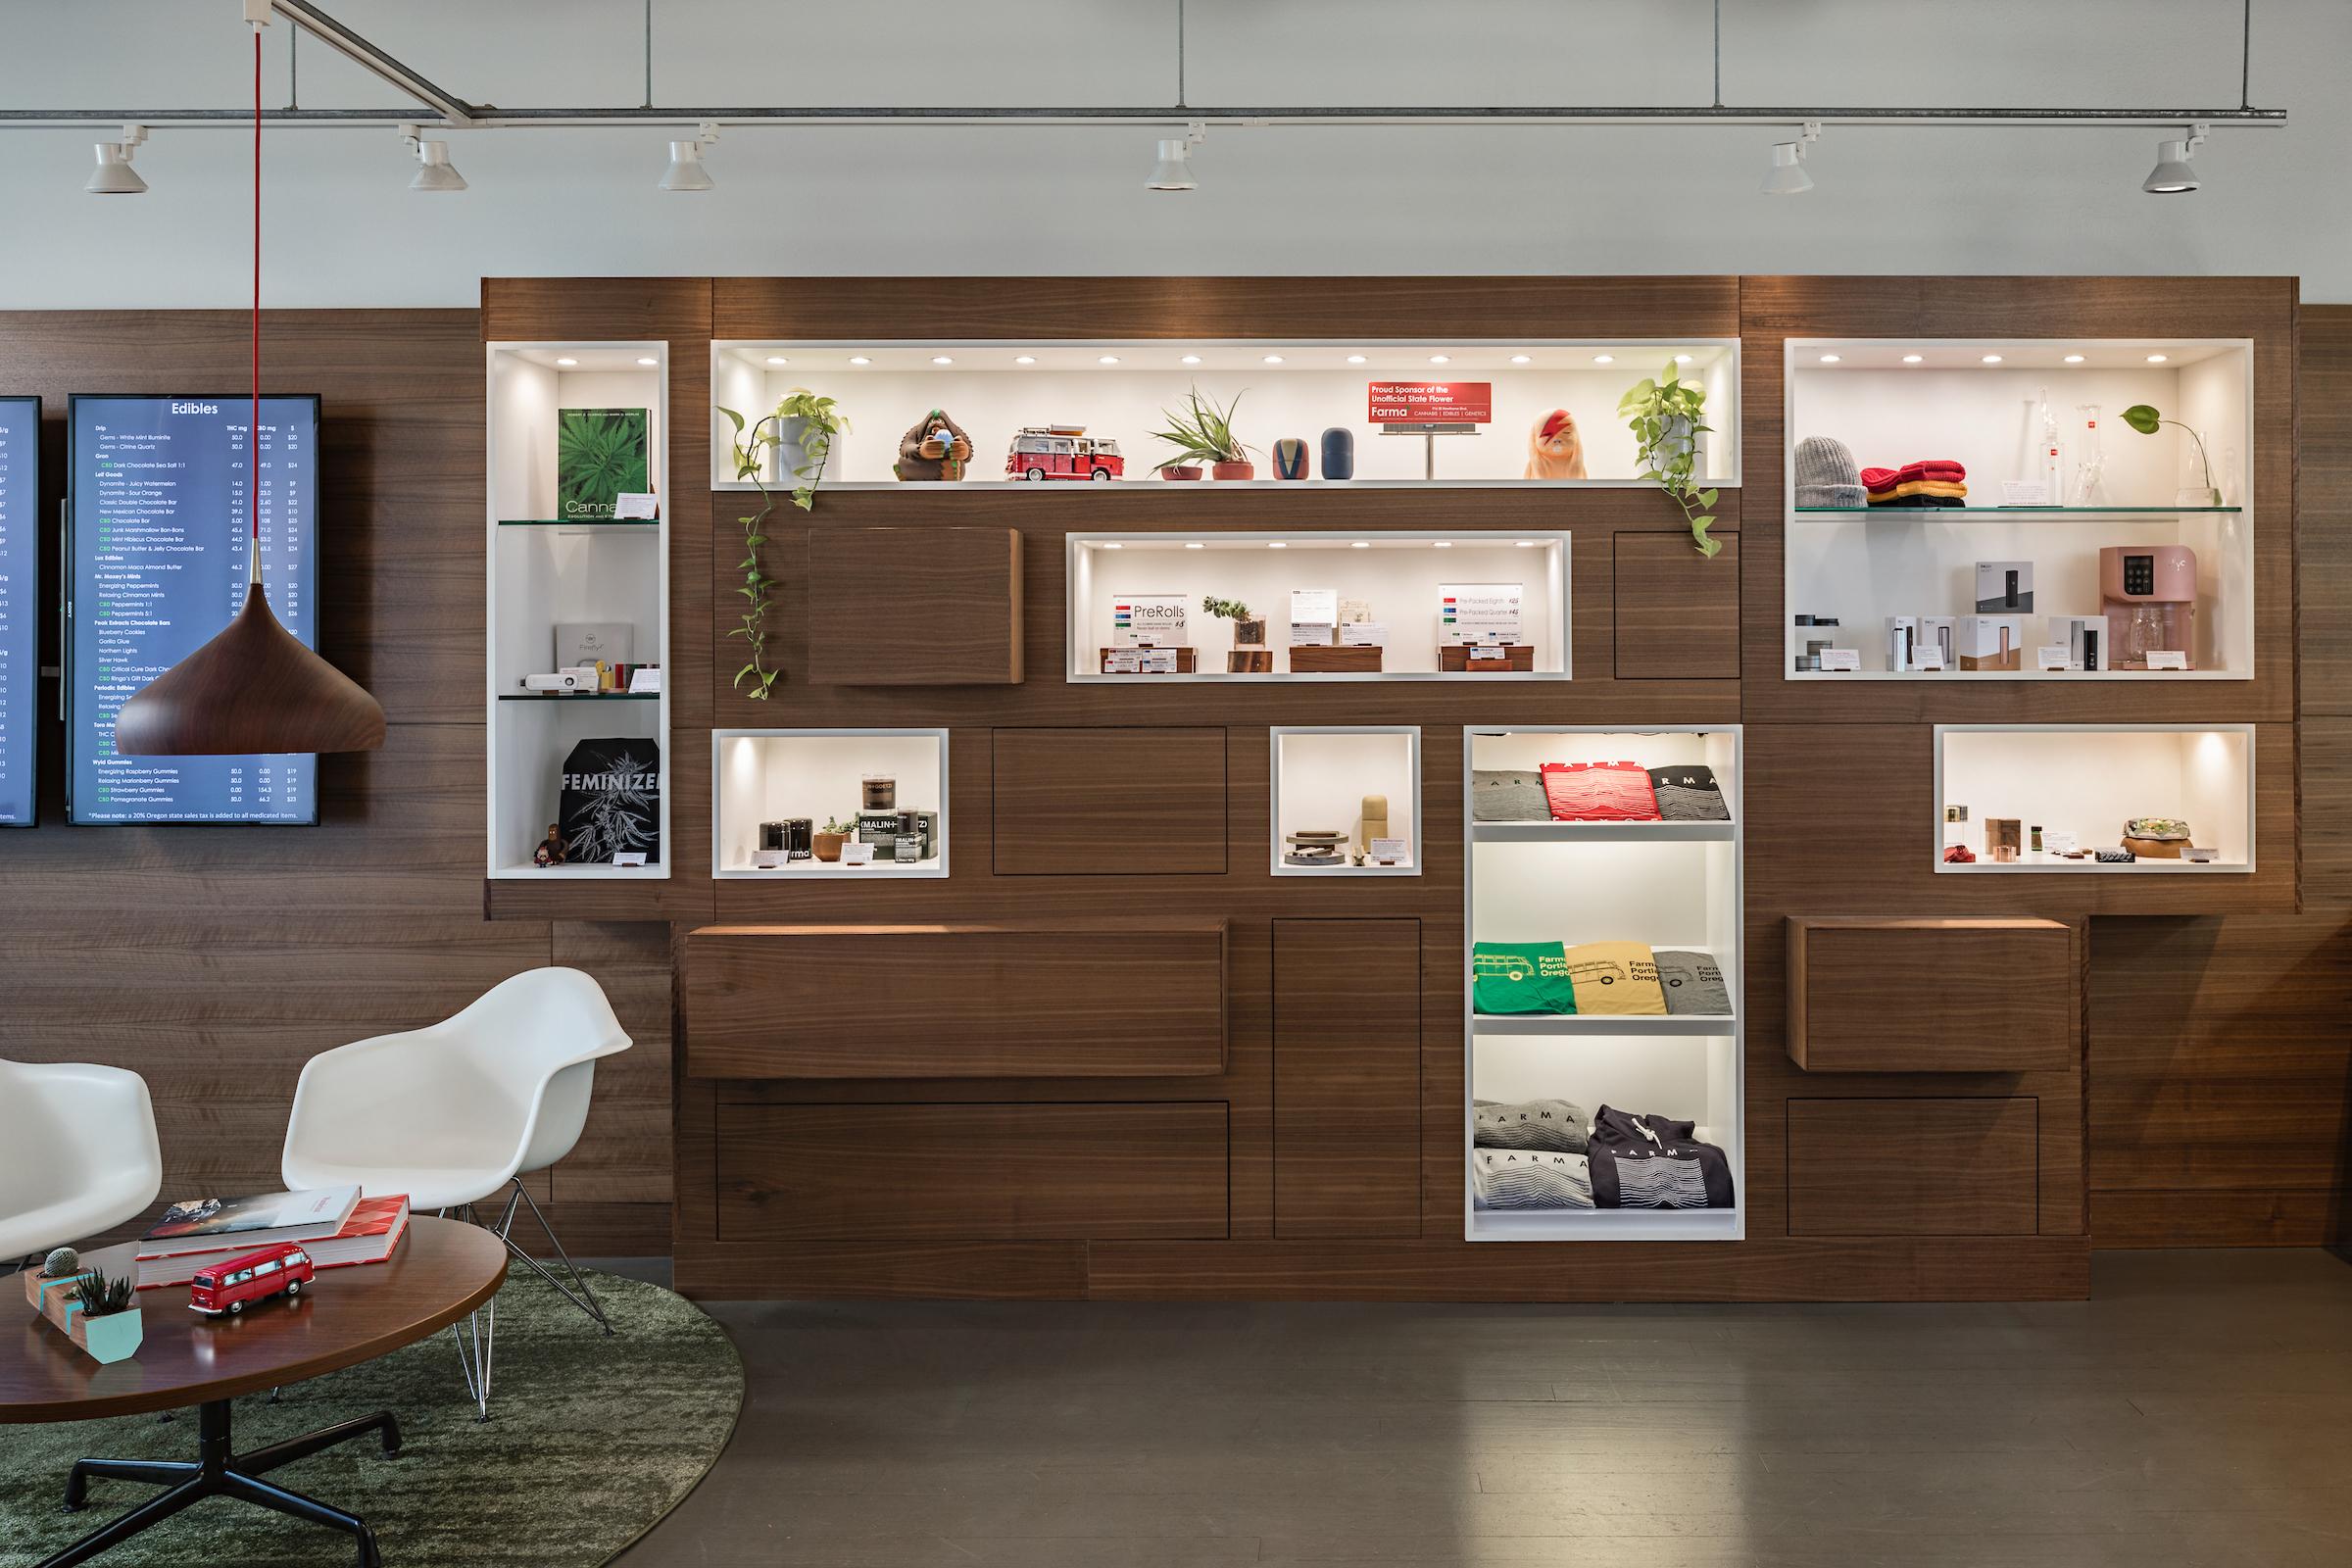 Custom cabinetry and lighting